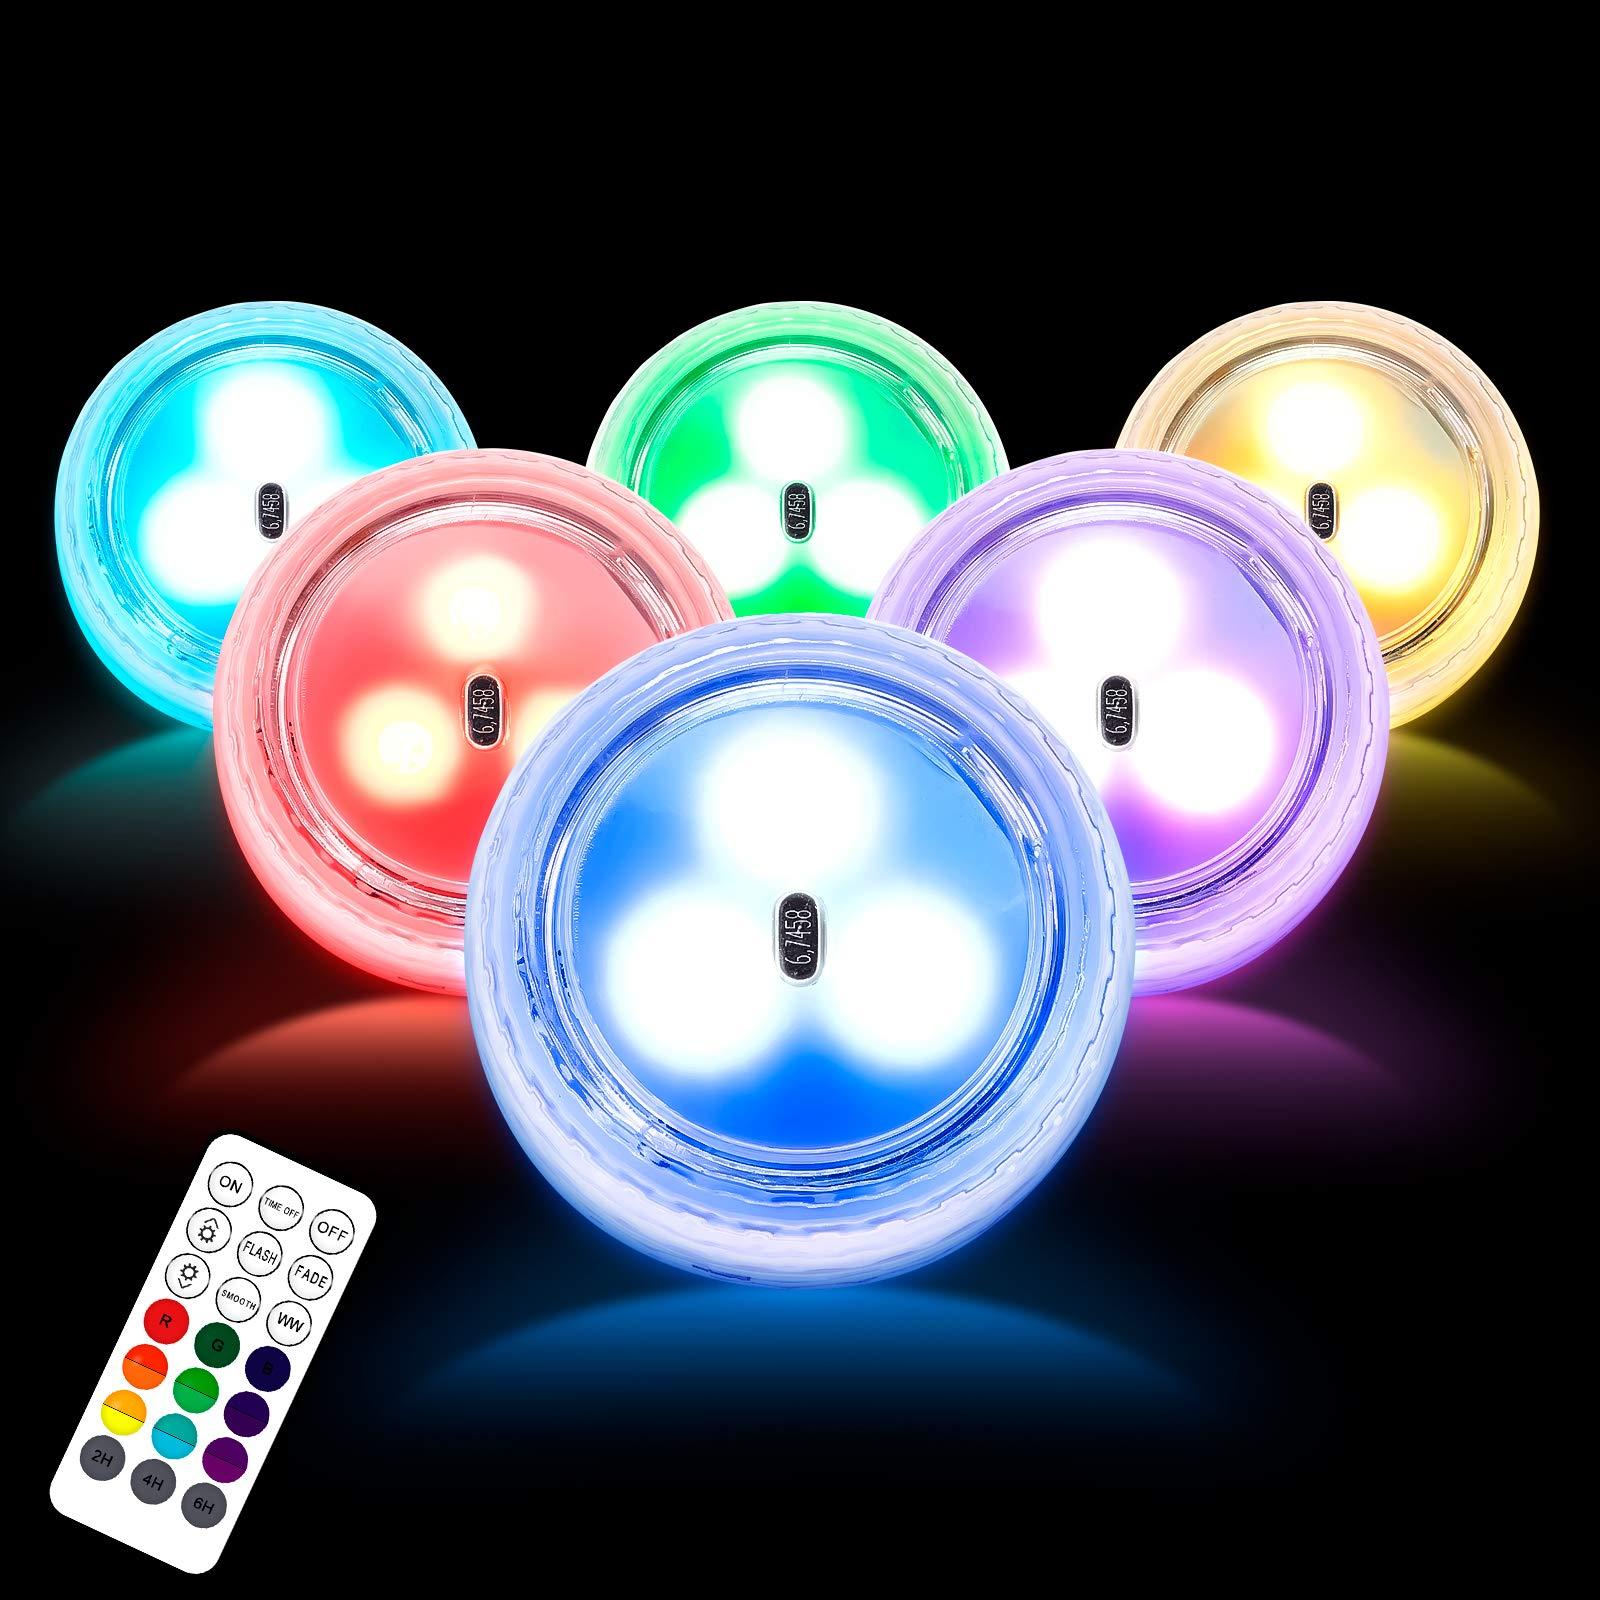 LOFTEK Mini Submersible LED Lights 6 PCS Battery Operated LED Color Changing